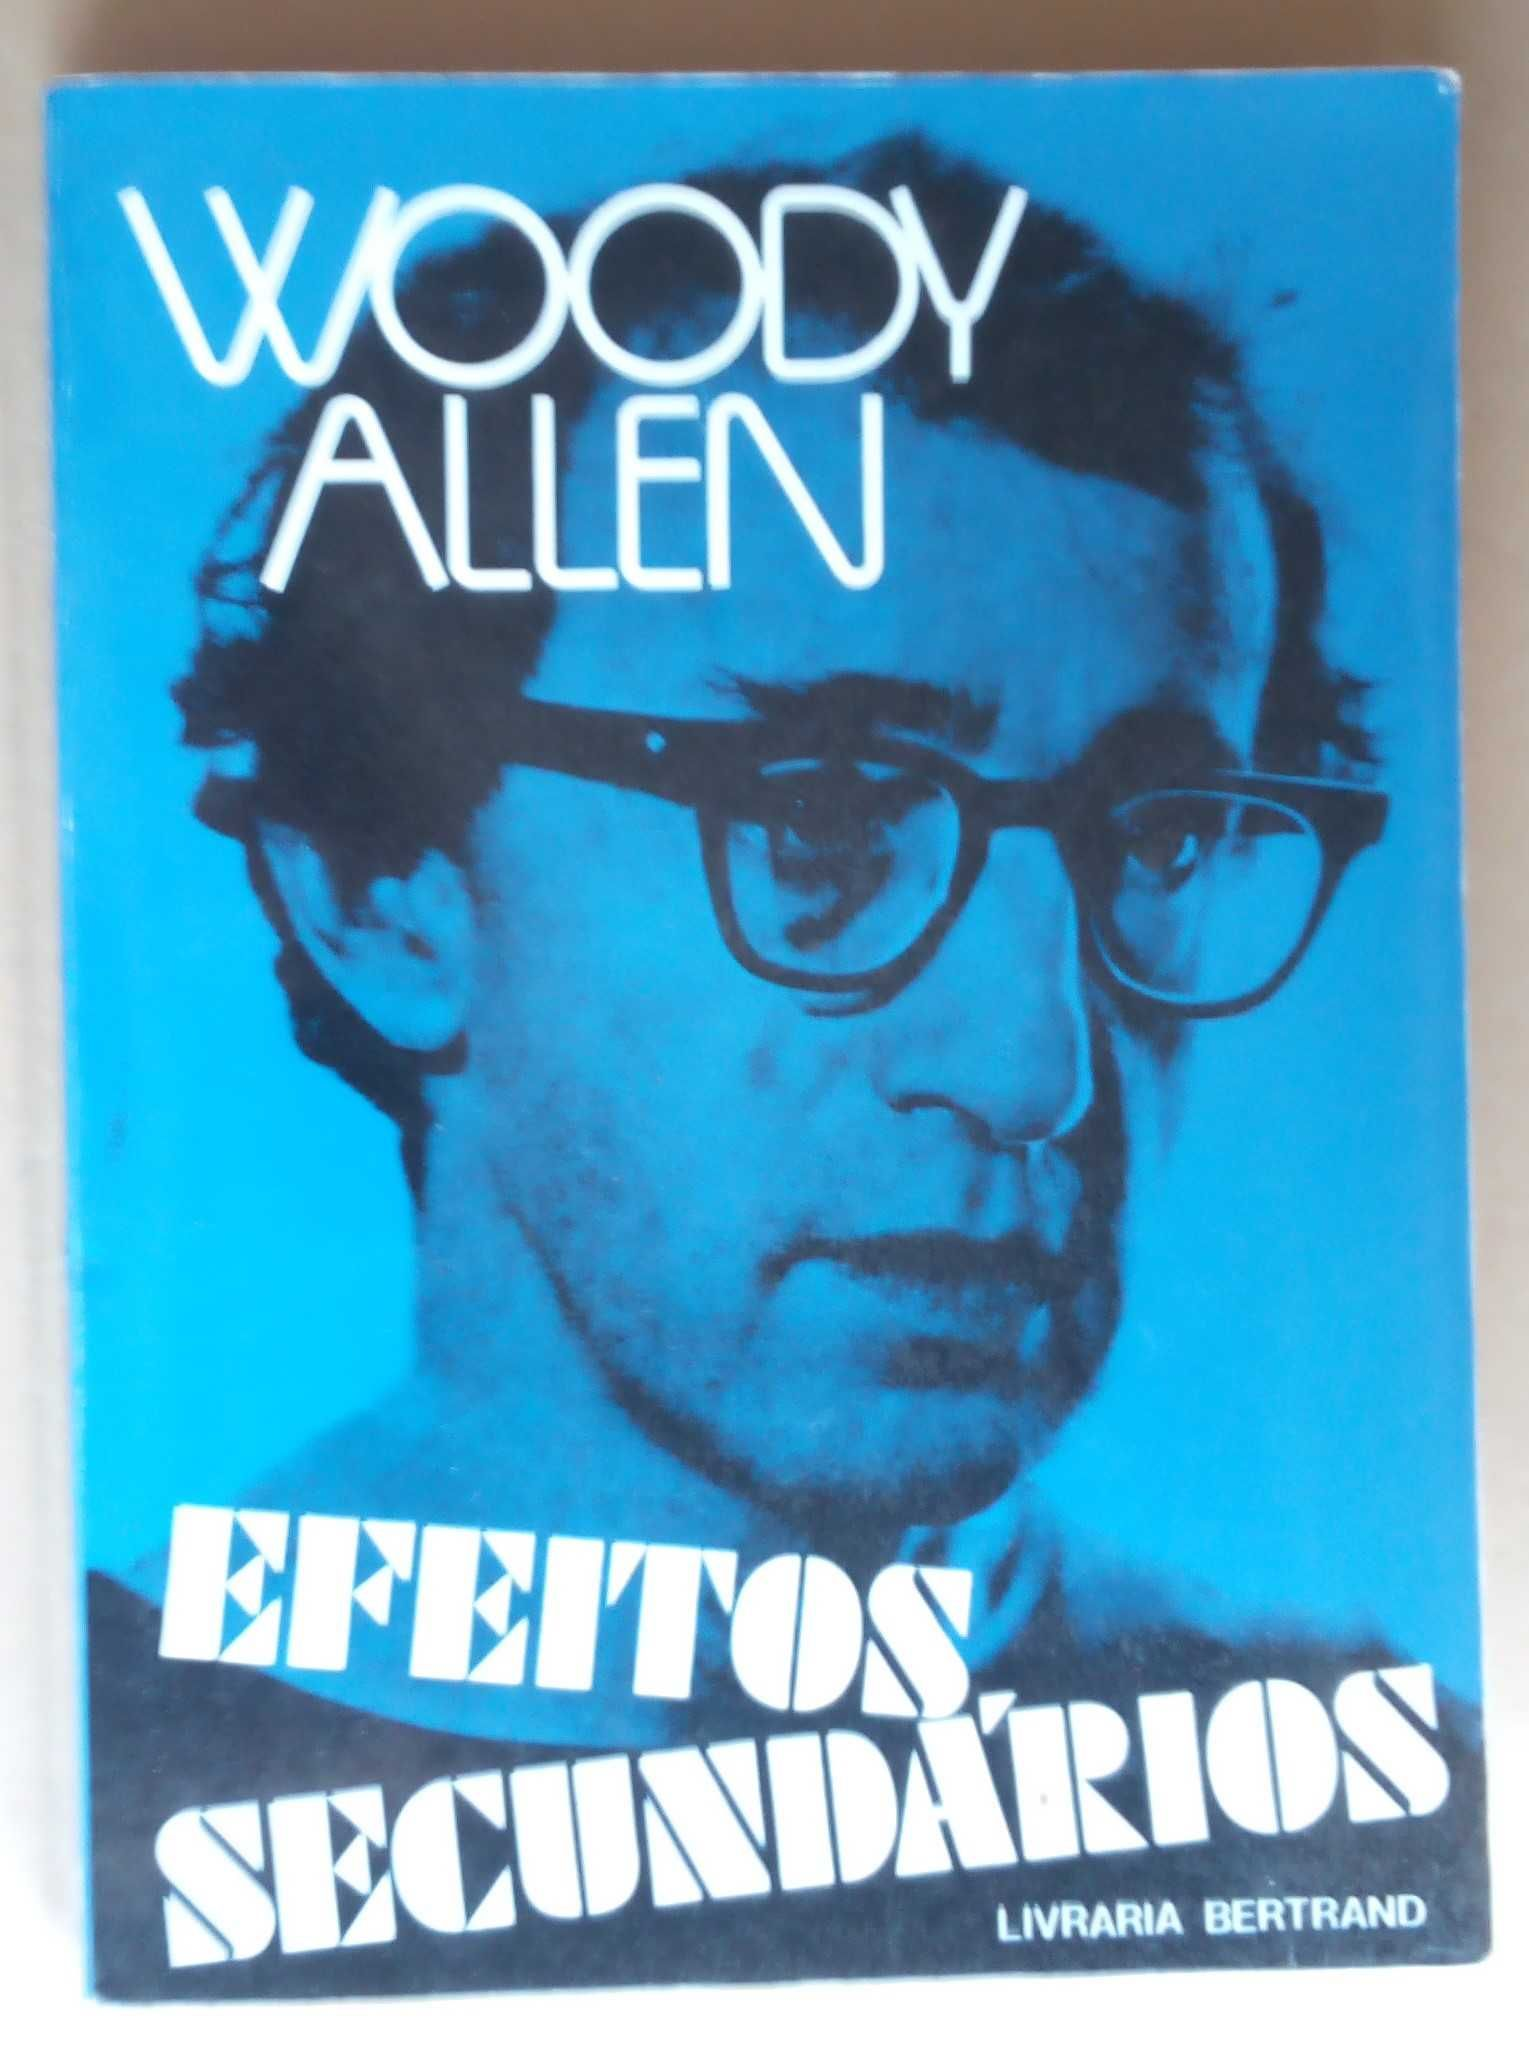 efeitos secundários / woody allen